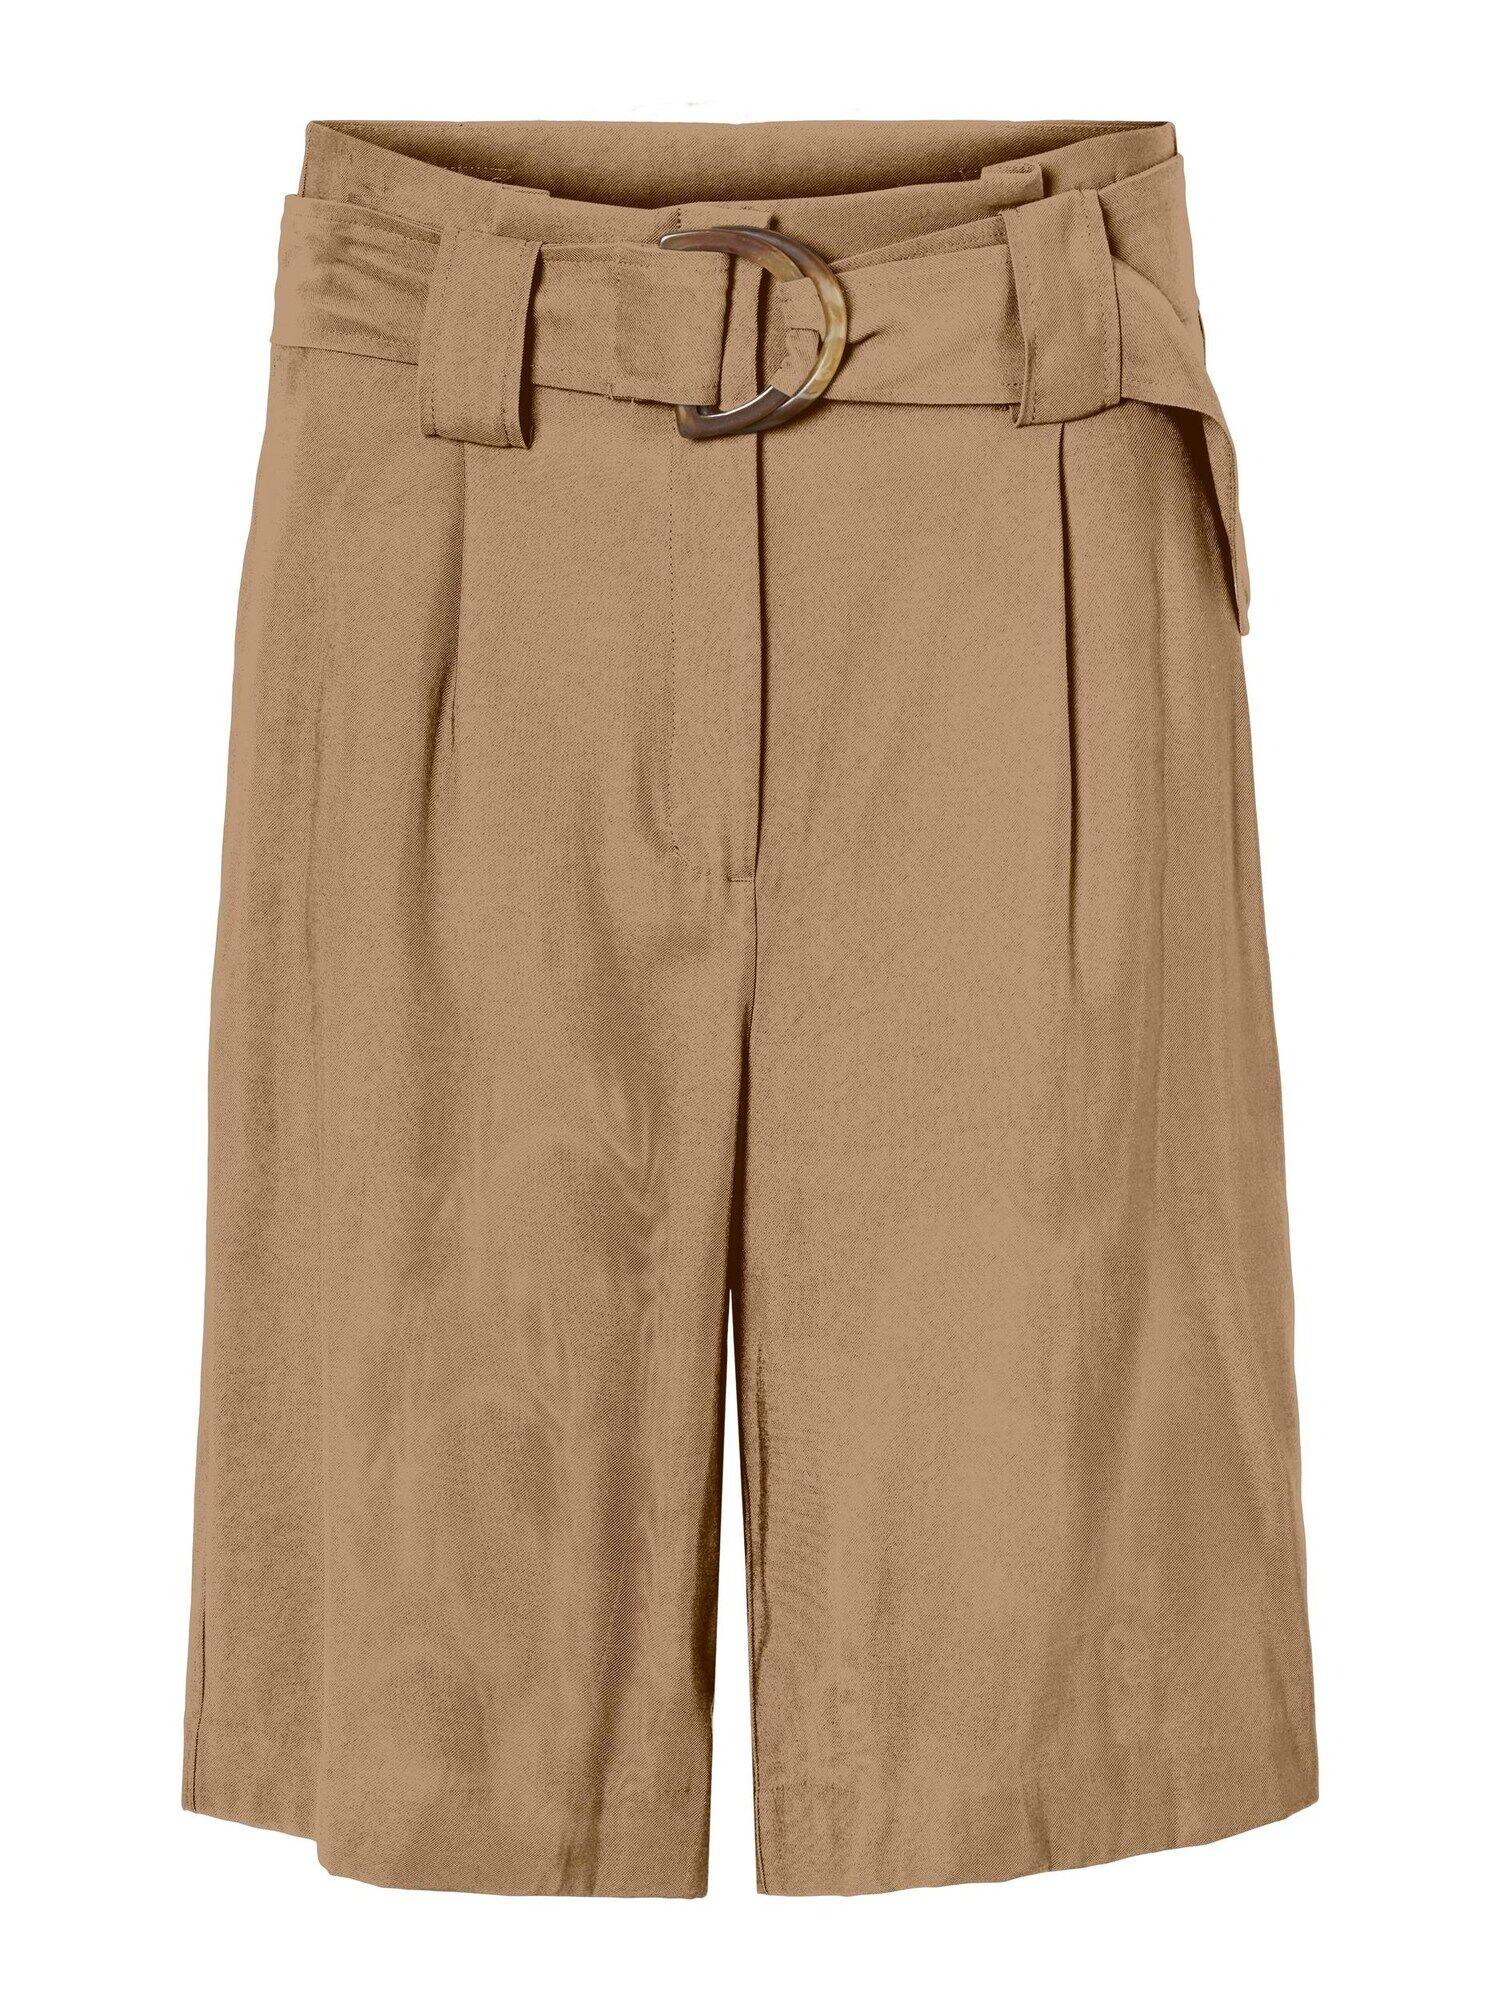 VERO MODA Pantalon à pince 'ORLA'  - Marron - Taille: 34 - female